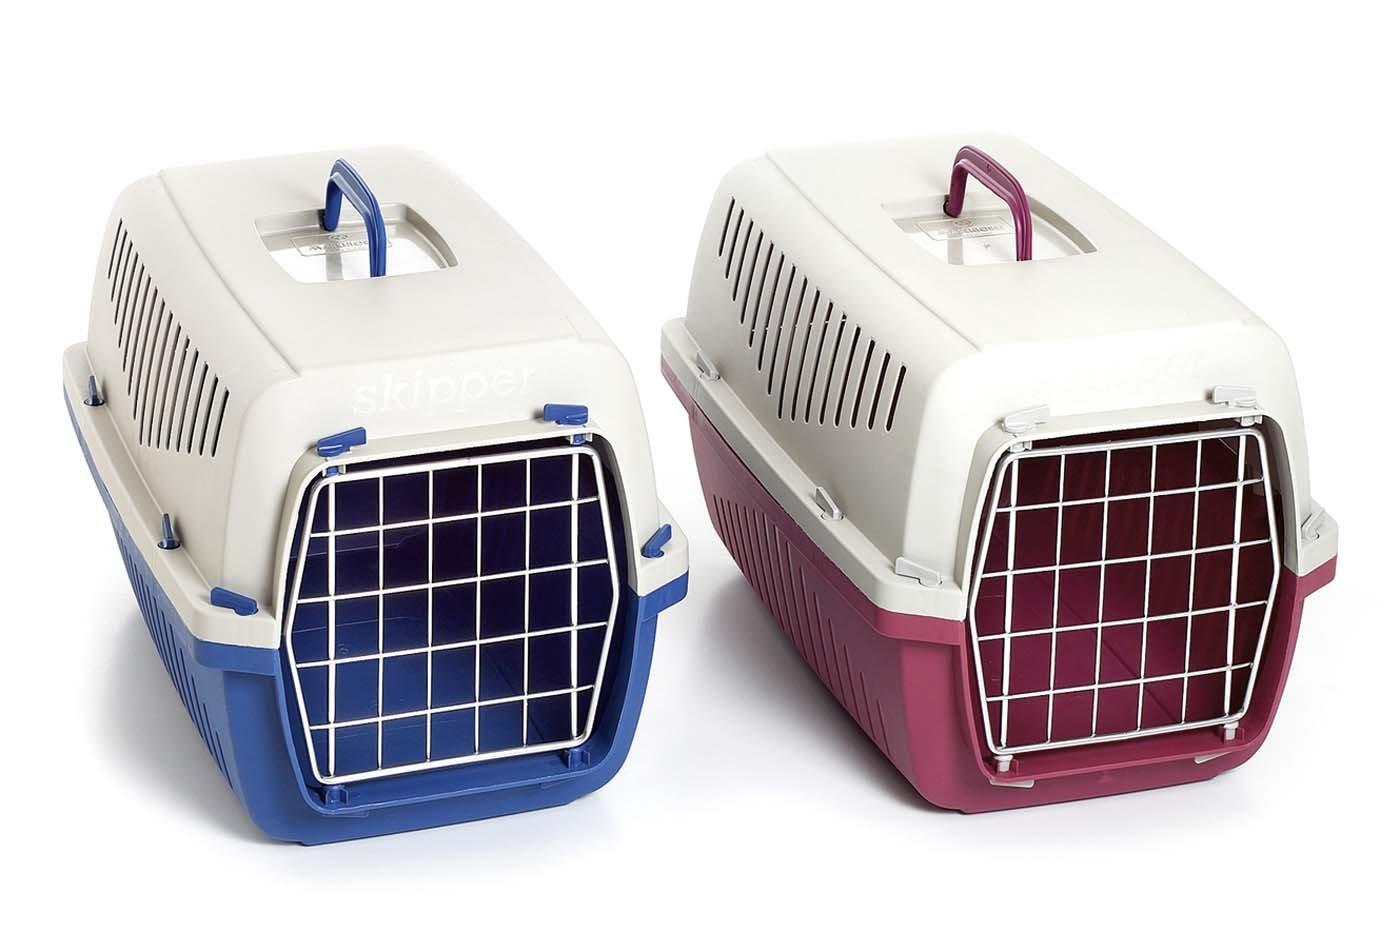 marchioro skipper 2 pet carrier wine 22 x 14 x 13 purely pet supplies ltd. Black Bedroom Furniture Sets. Home Design Ideas